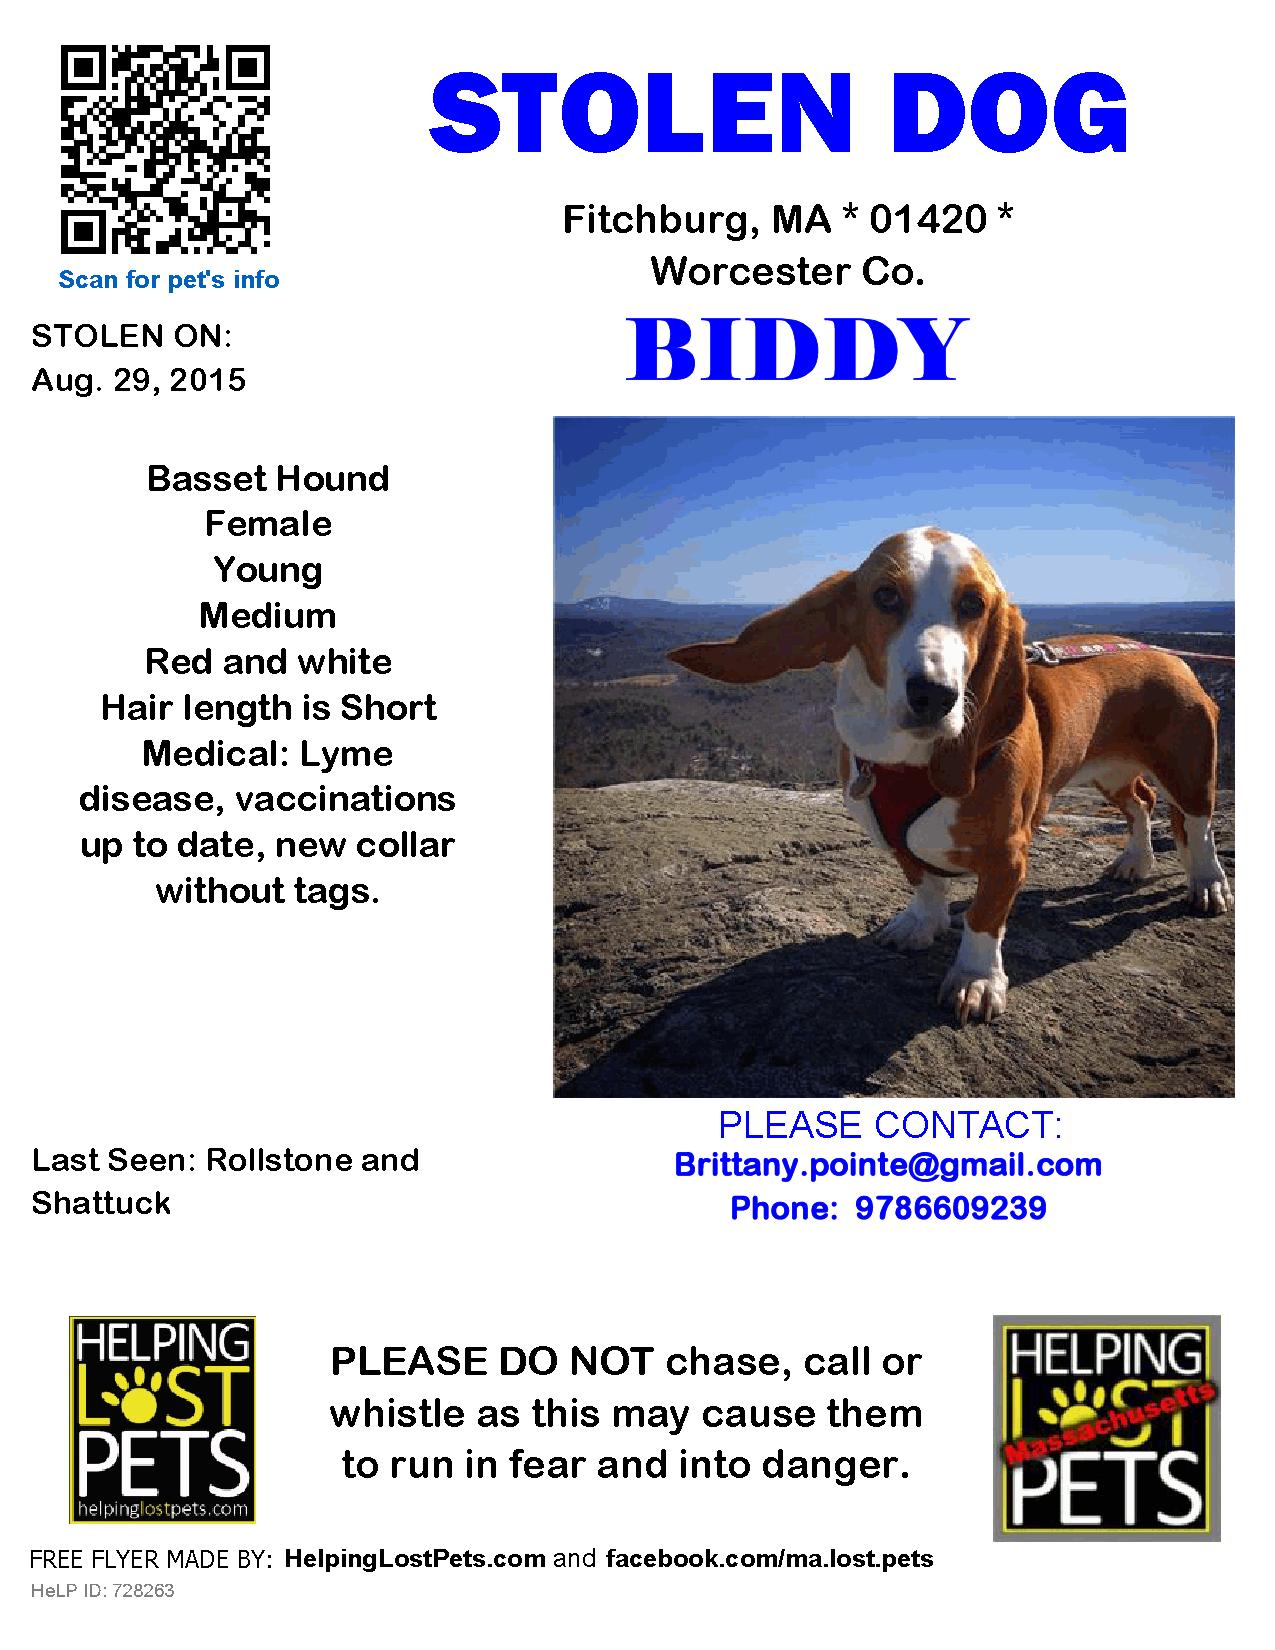 Stolen Dog Basset Hound Fitchburg Ma United States 01420 Basset Hound Losing A Dog Basset